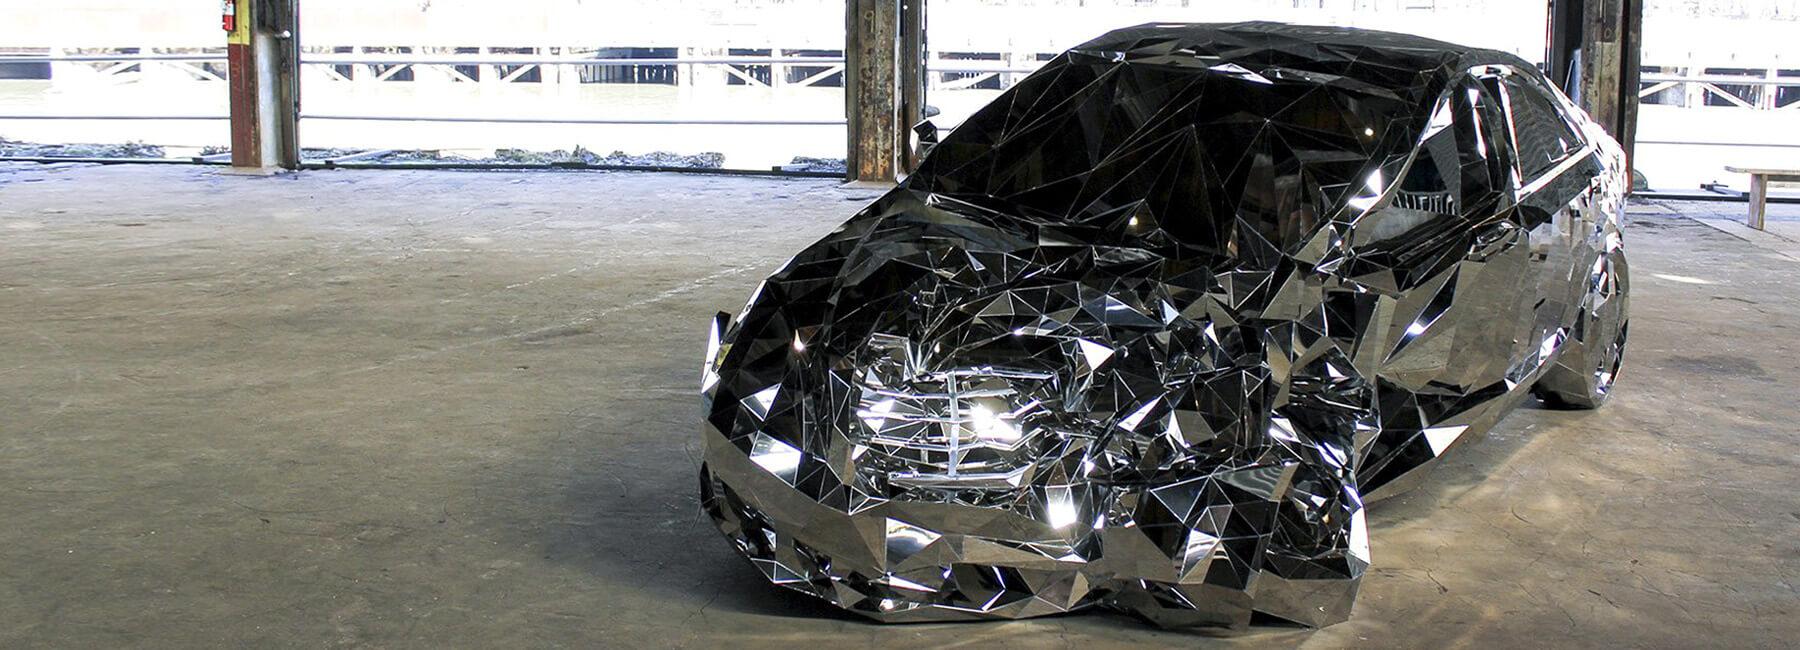 jordan griska wreck mirror mercedez